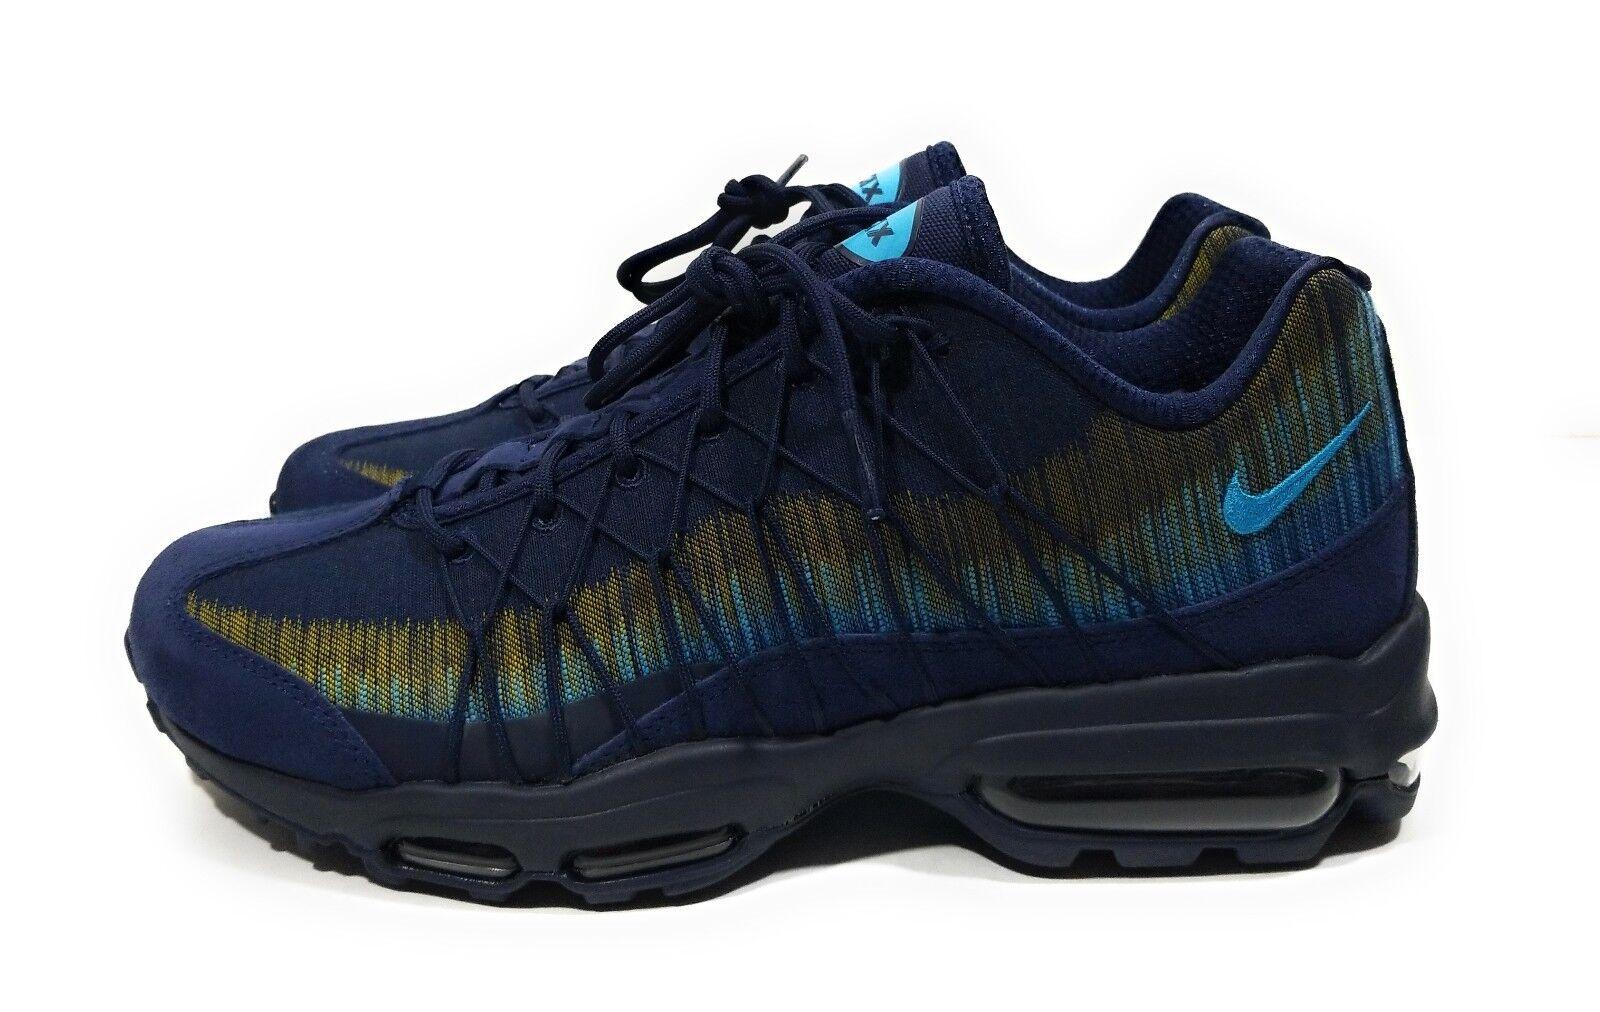 Nike Air Max 95 Ultra Jacquard Mens Running shoes Navy bluee Size 9